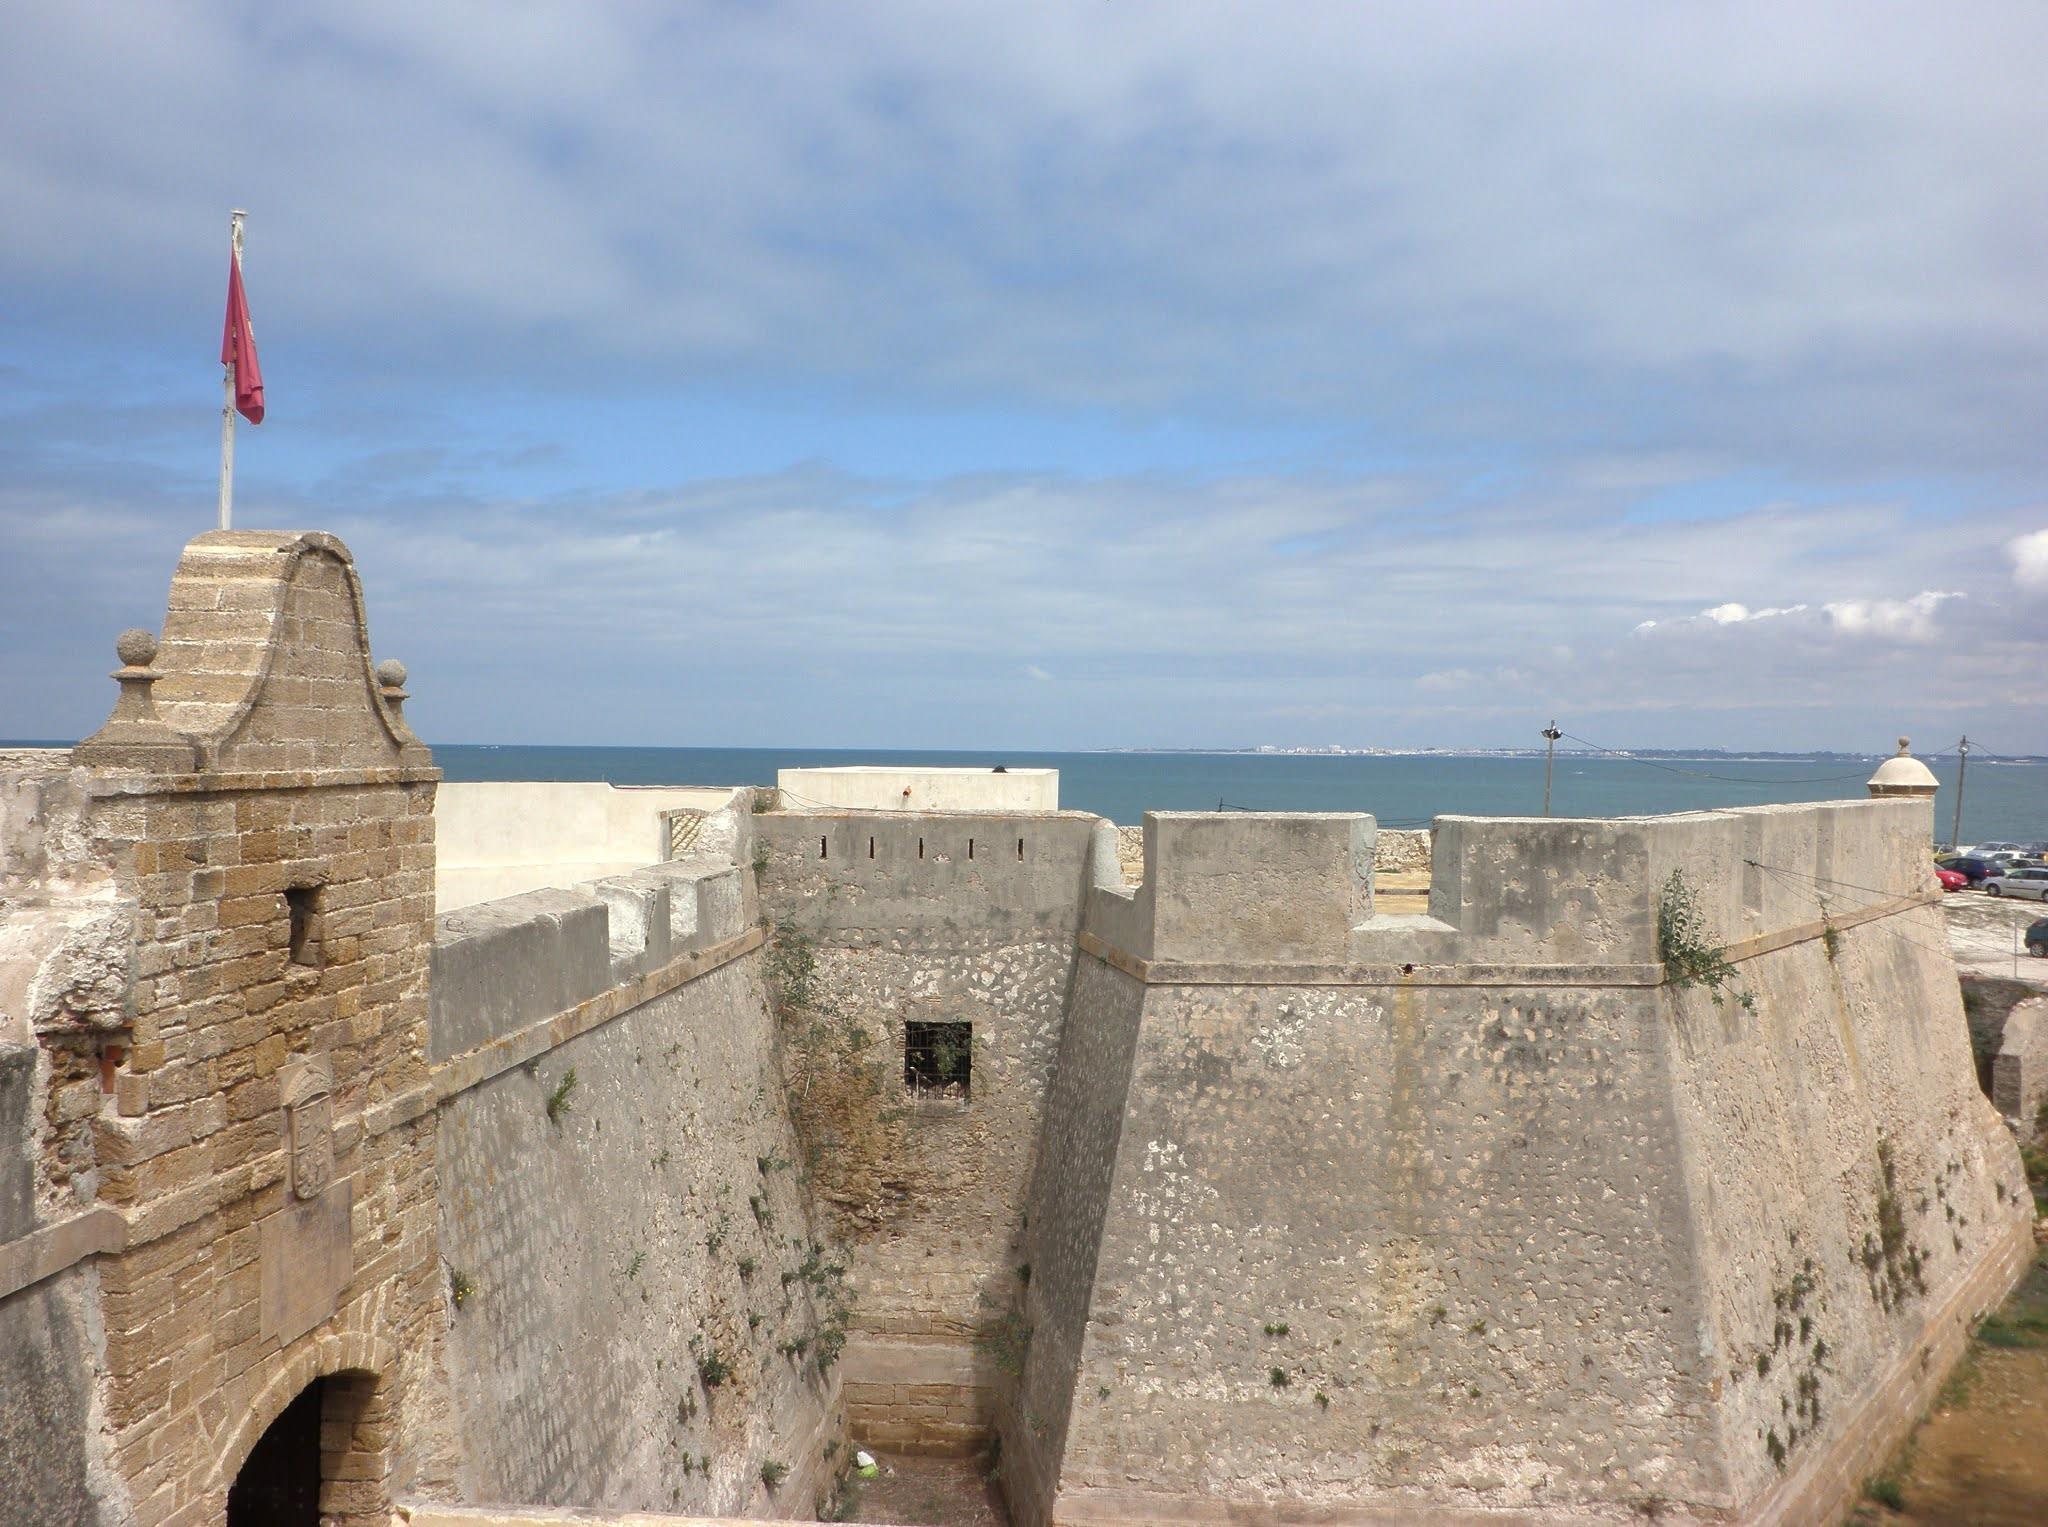 Tour-Castillos-y-Baluartes-de-Cadiz-9